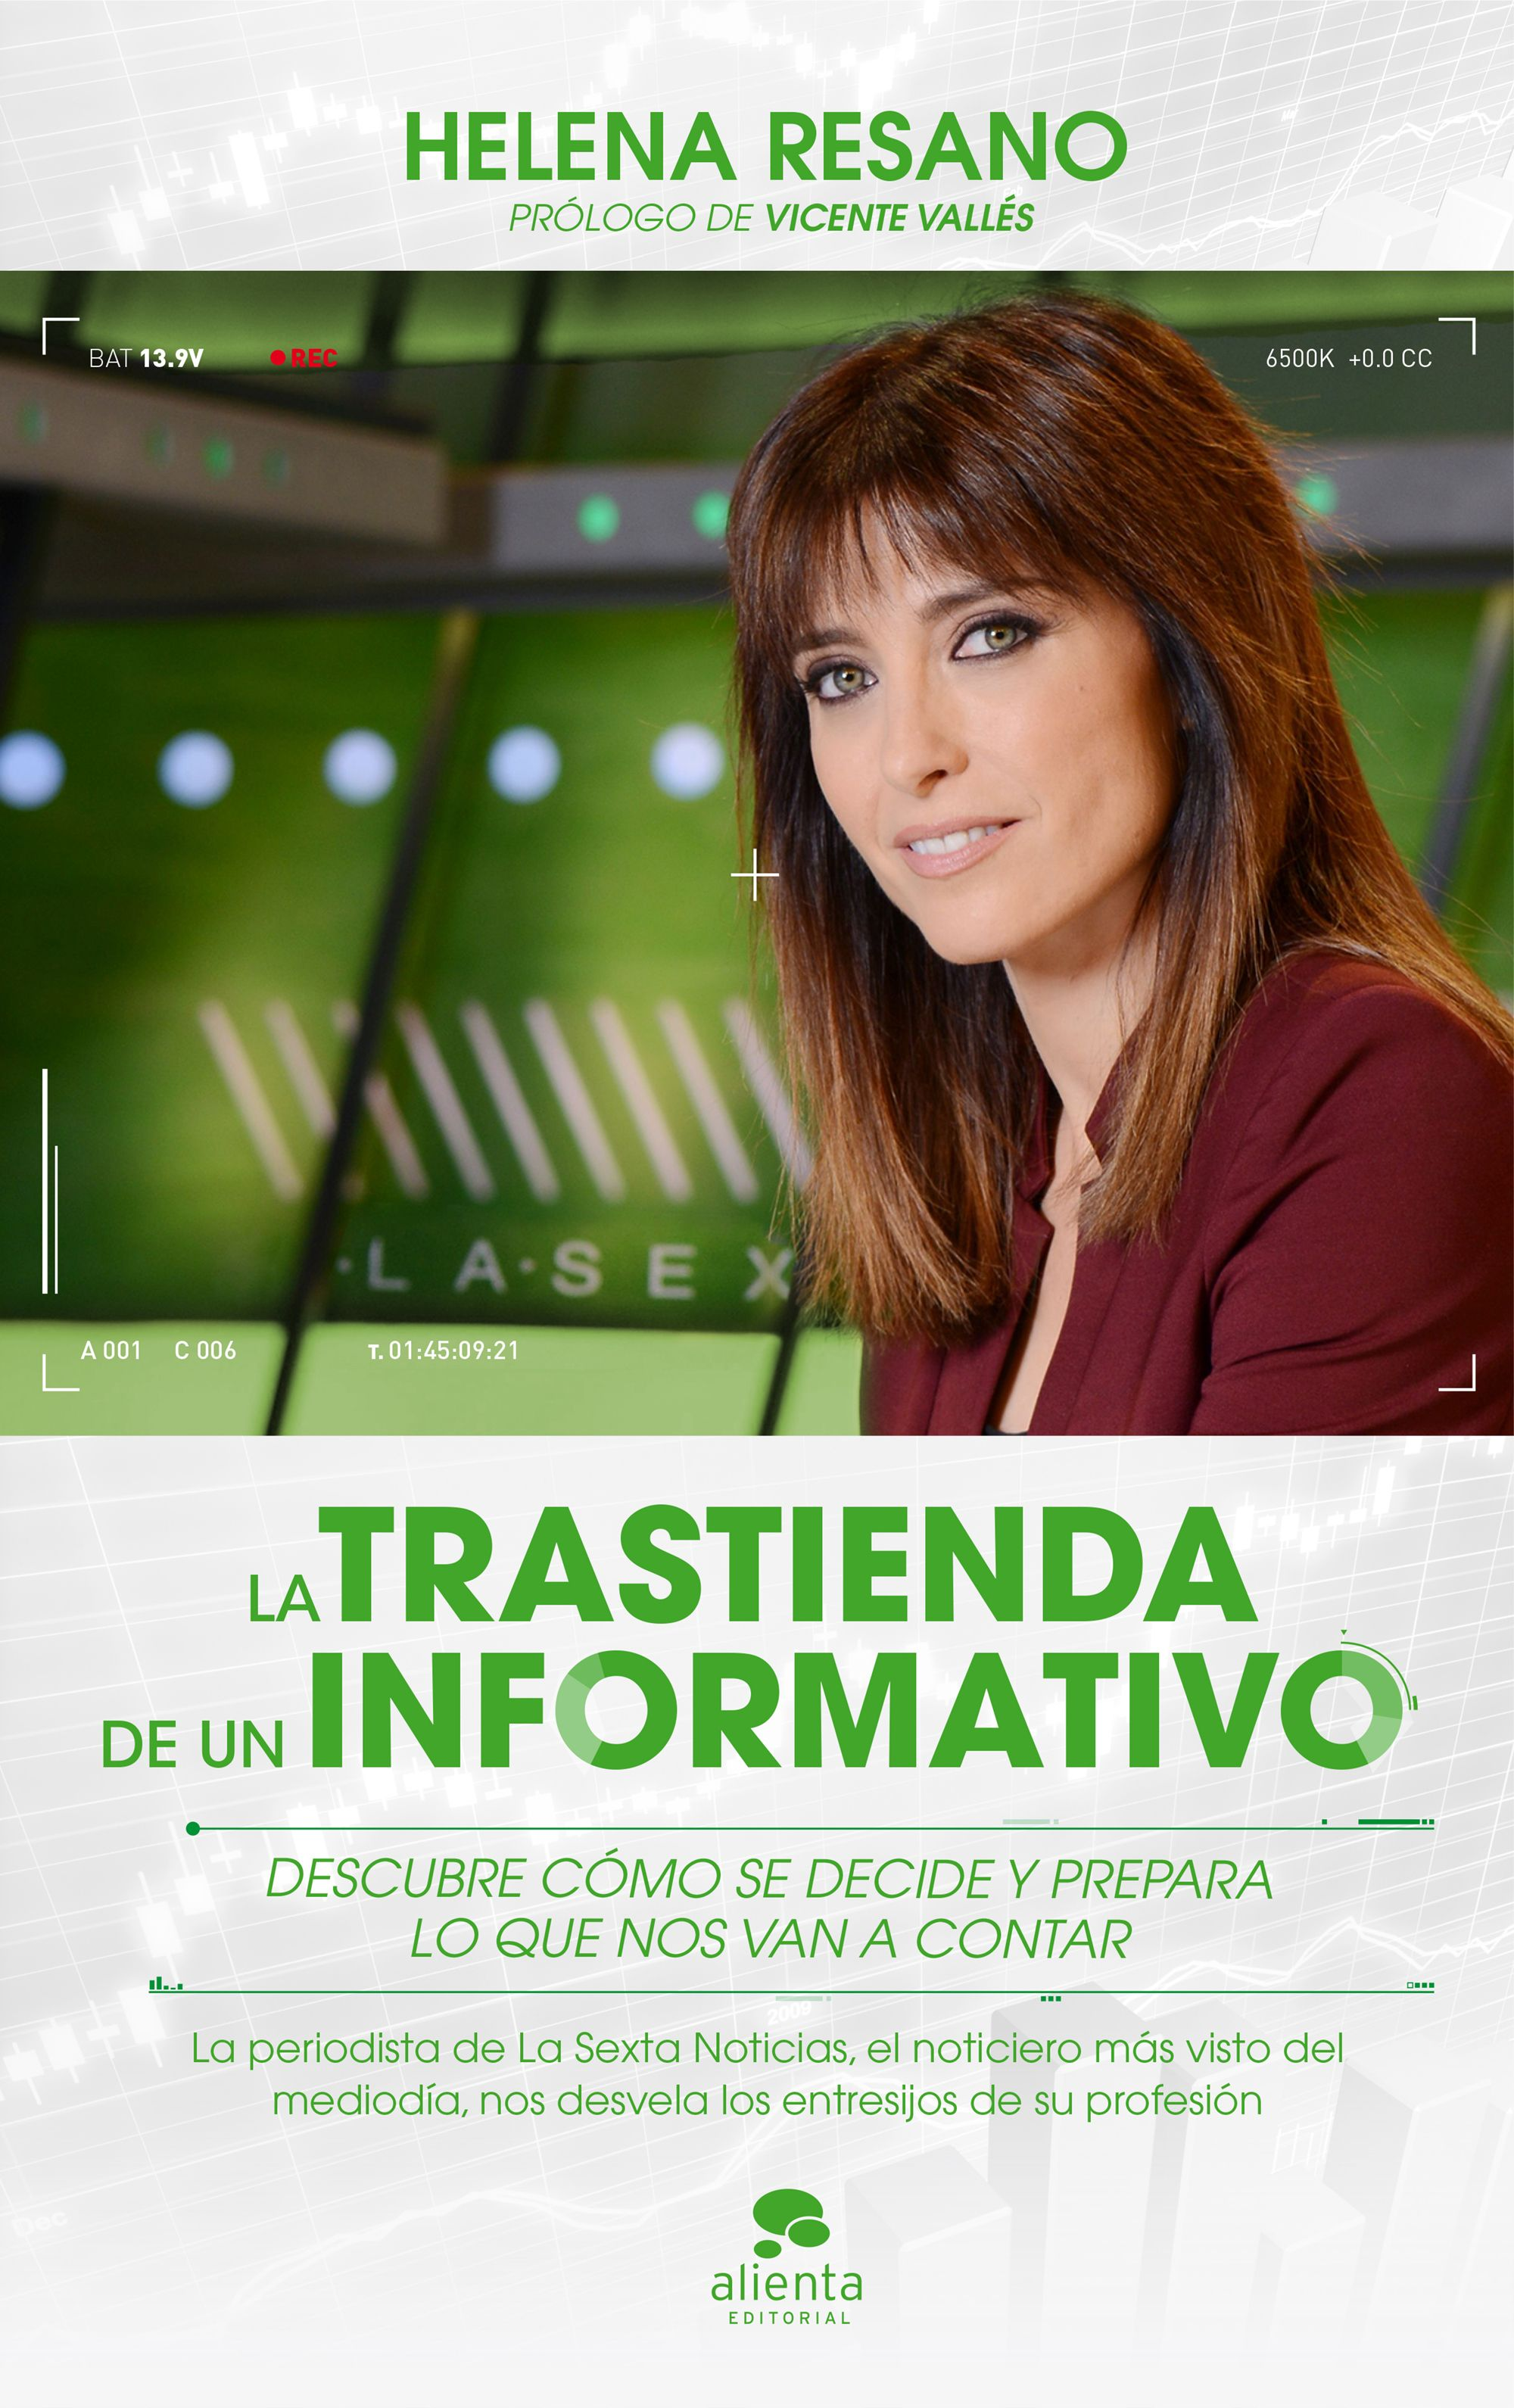 2016-05-23-1464018322-3765251-Portada_Latrastiendadeuninformativo_g1.jpg